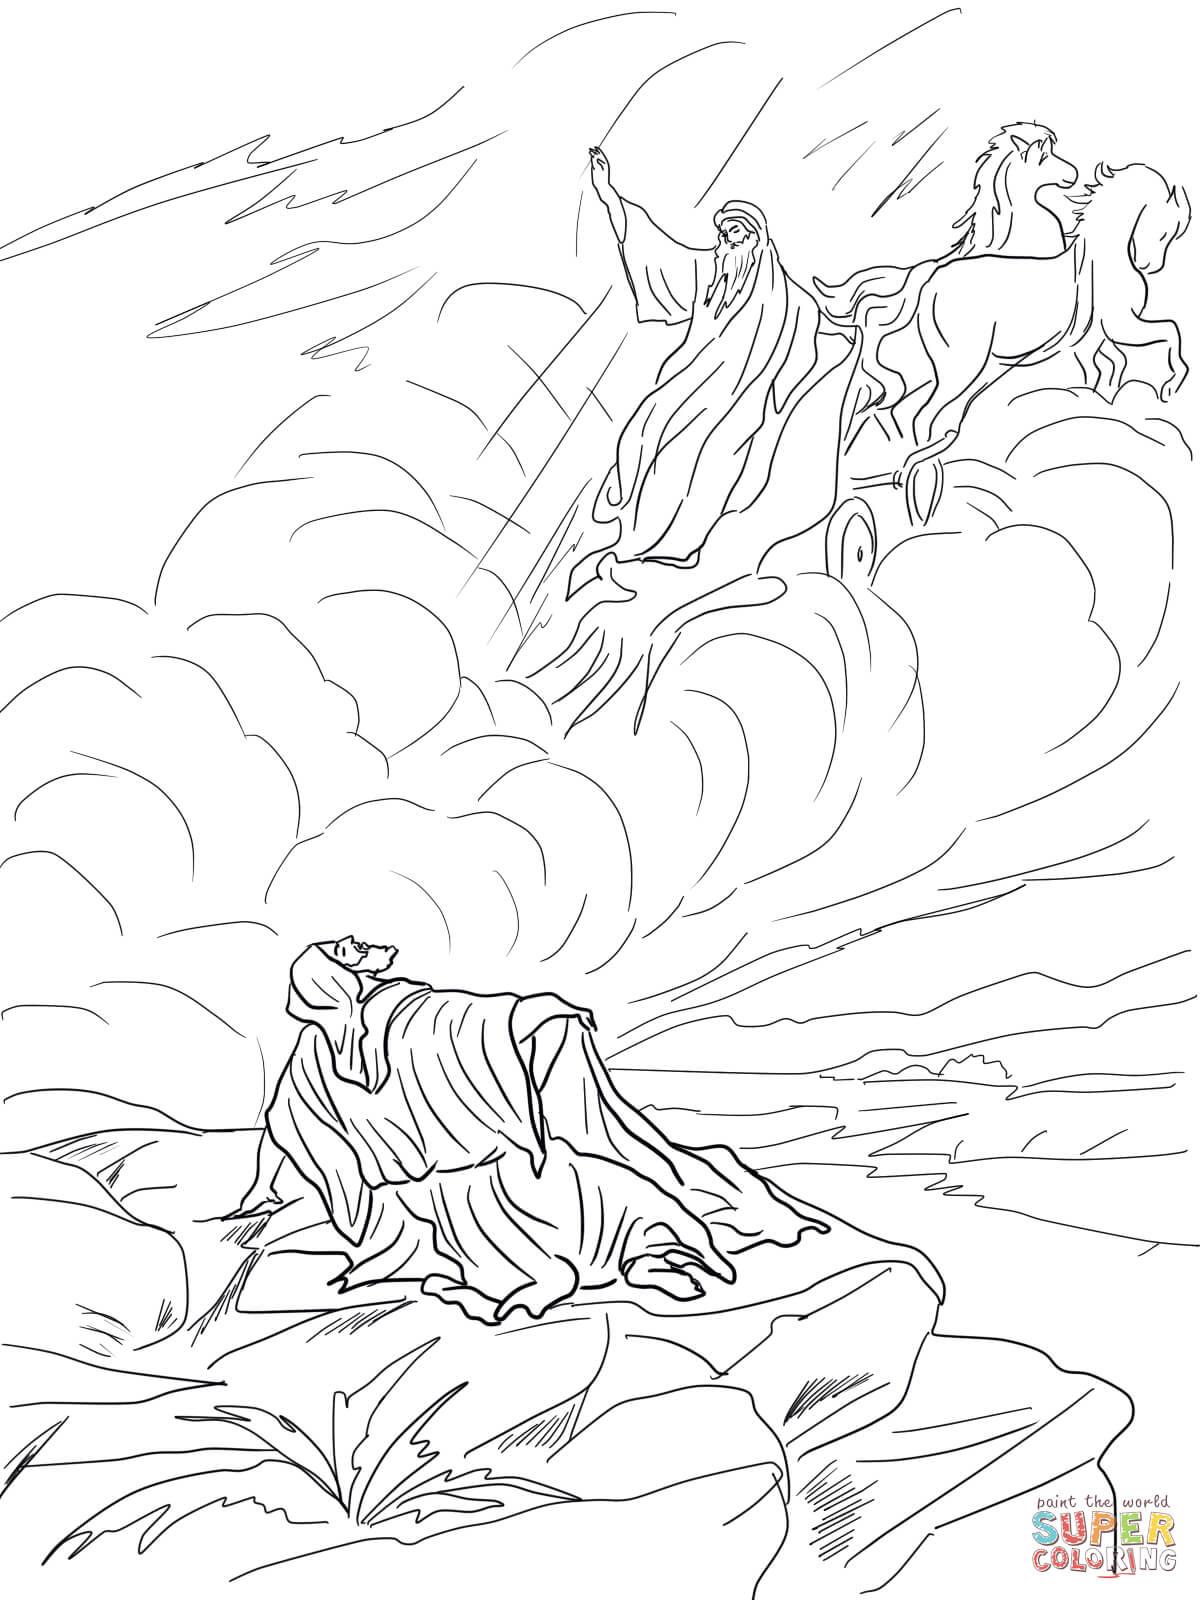 Free coloring page elijah - Free Coloring Pages Elijah Goes To Heaven